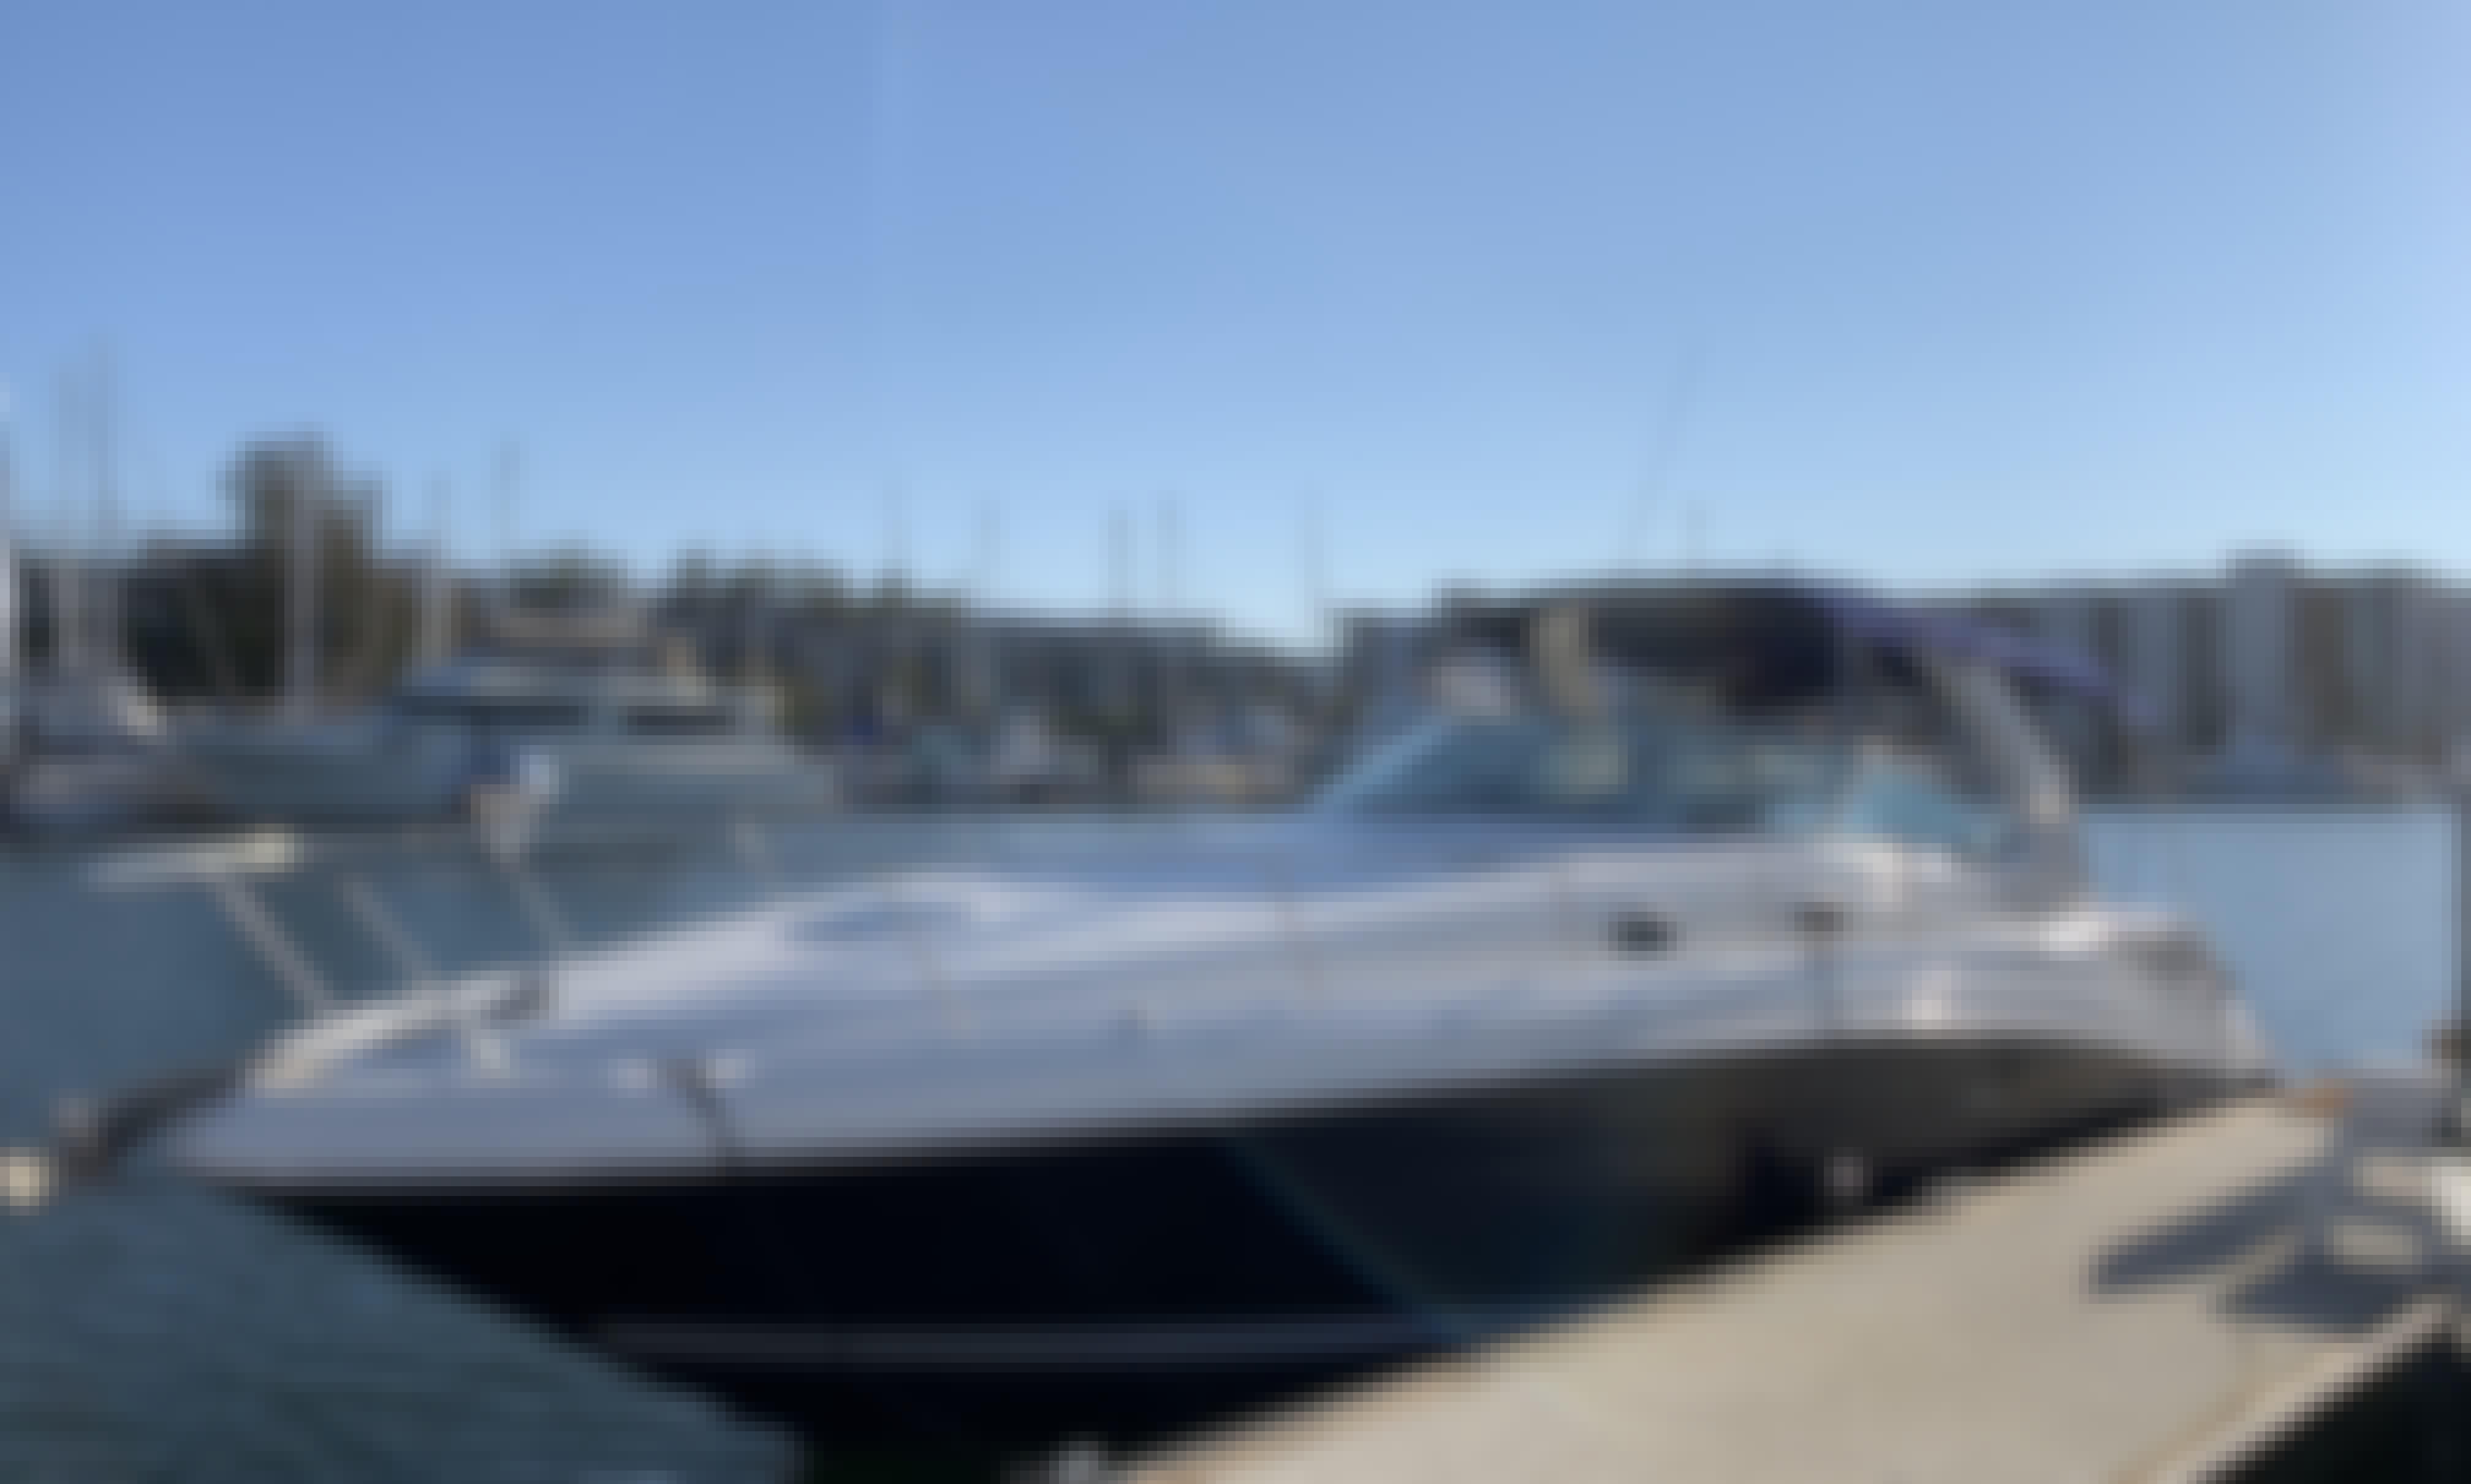 38' Sea Ray Sundancer in Marina del Rey, California